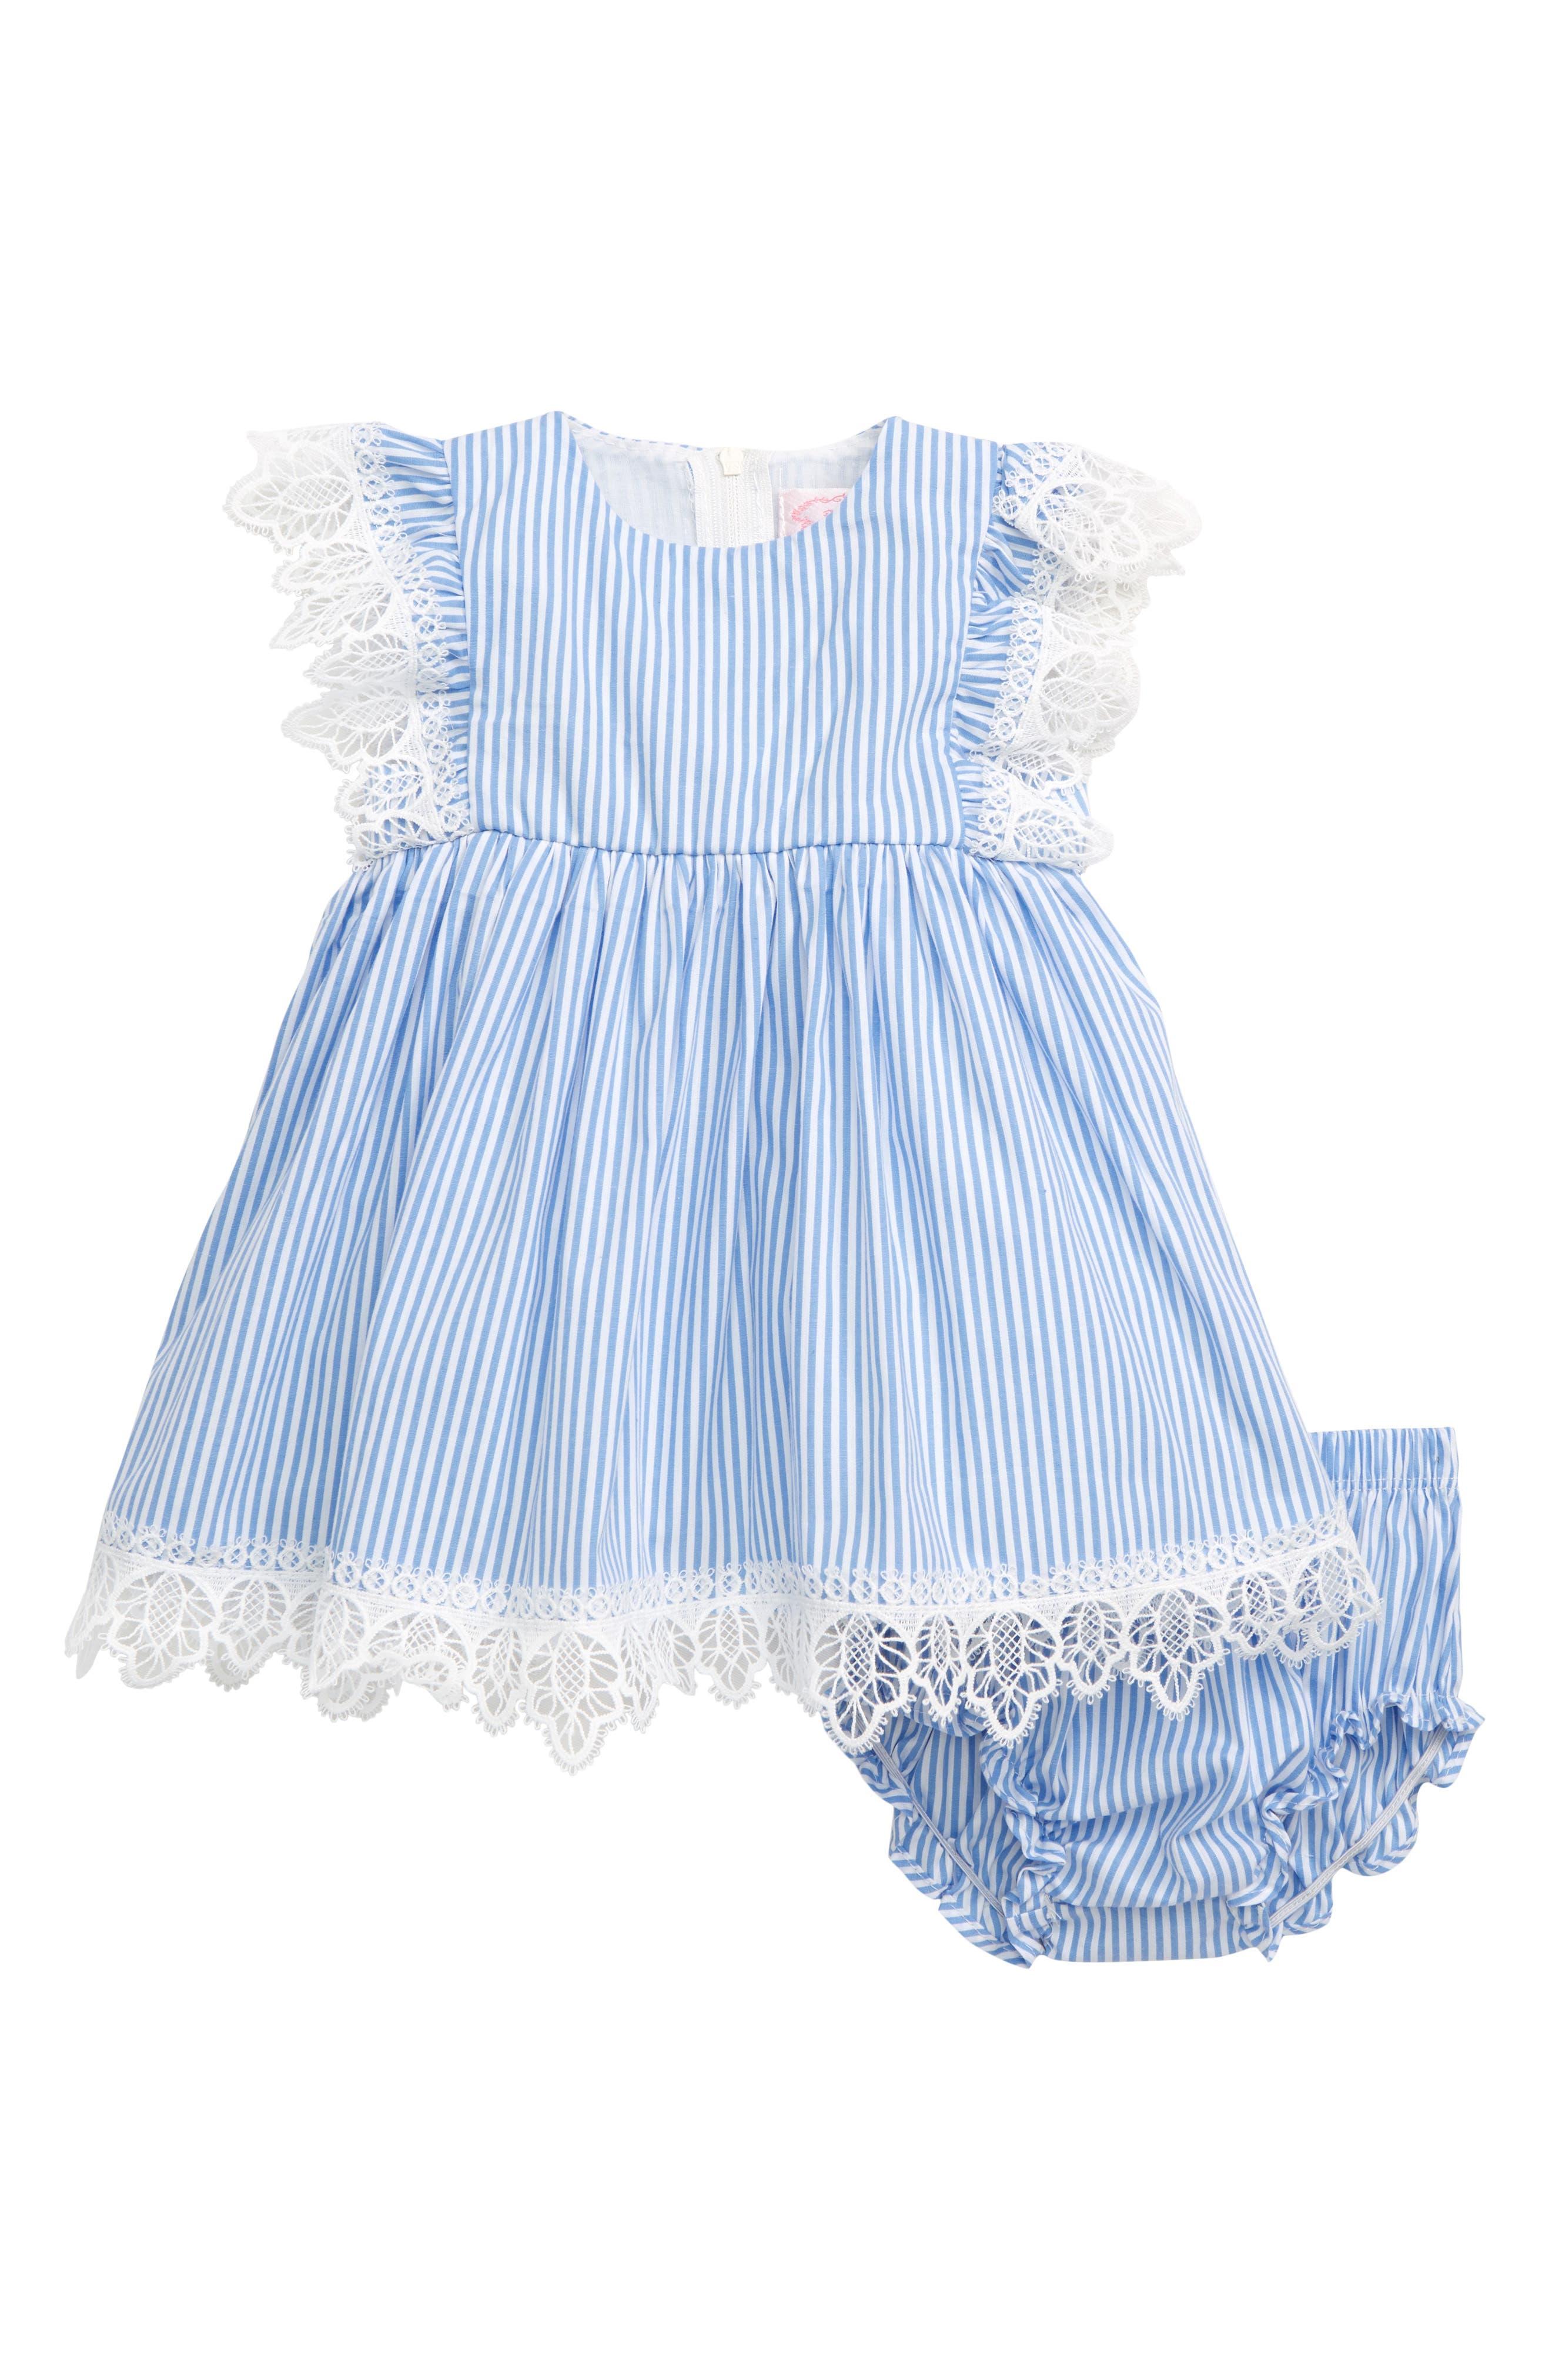 POPATU, Lace & Stripe Pinafore Dress, Main thumbnail 1, color, BLUE